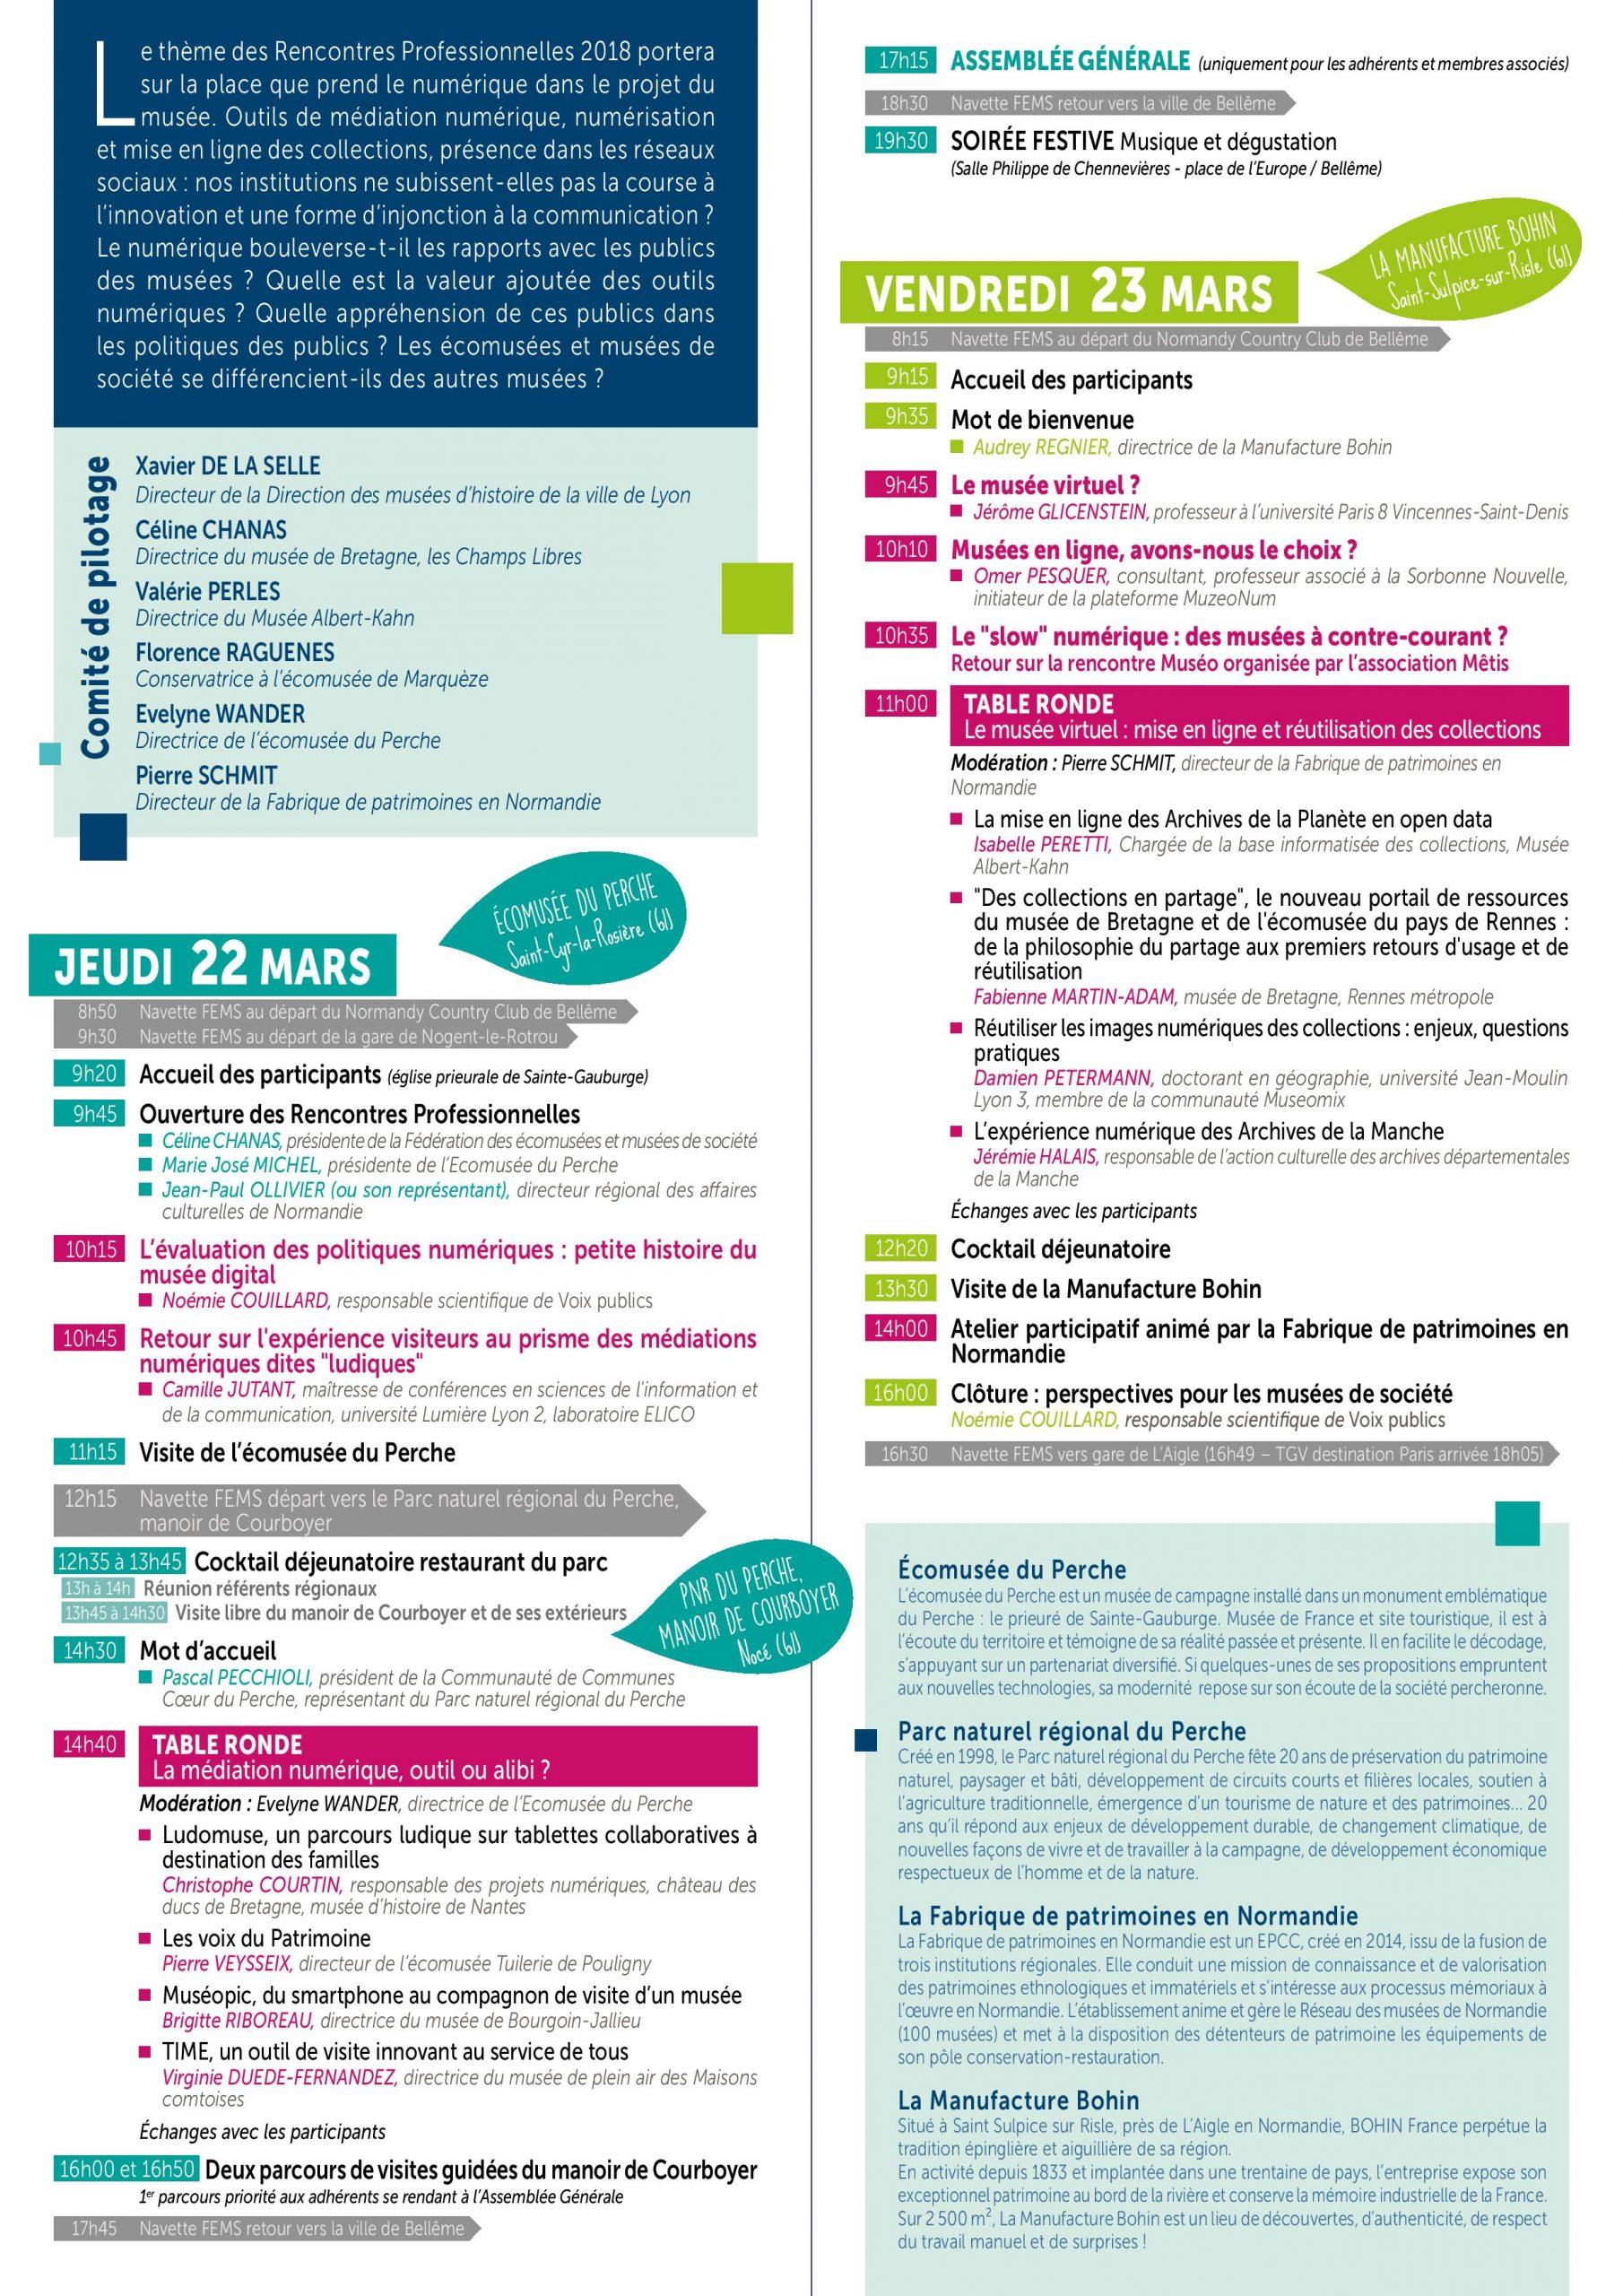 FEMS-RencontresPro-2018-v3-page-002